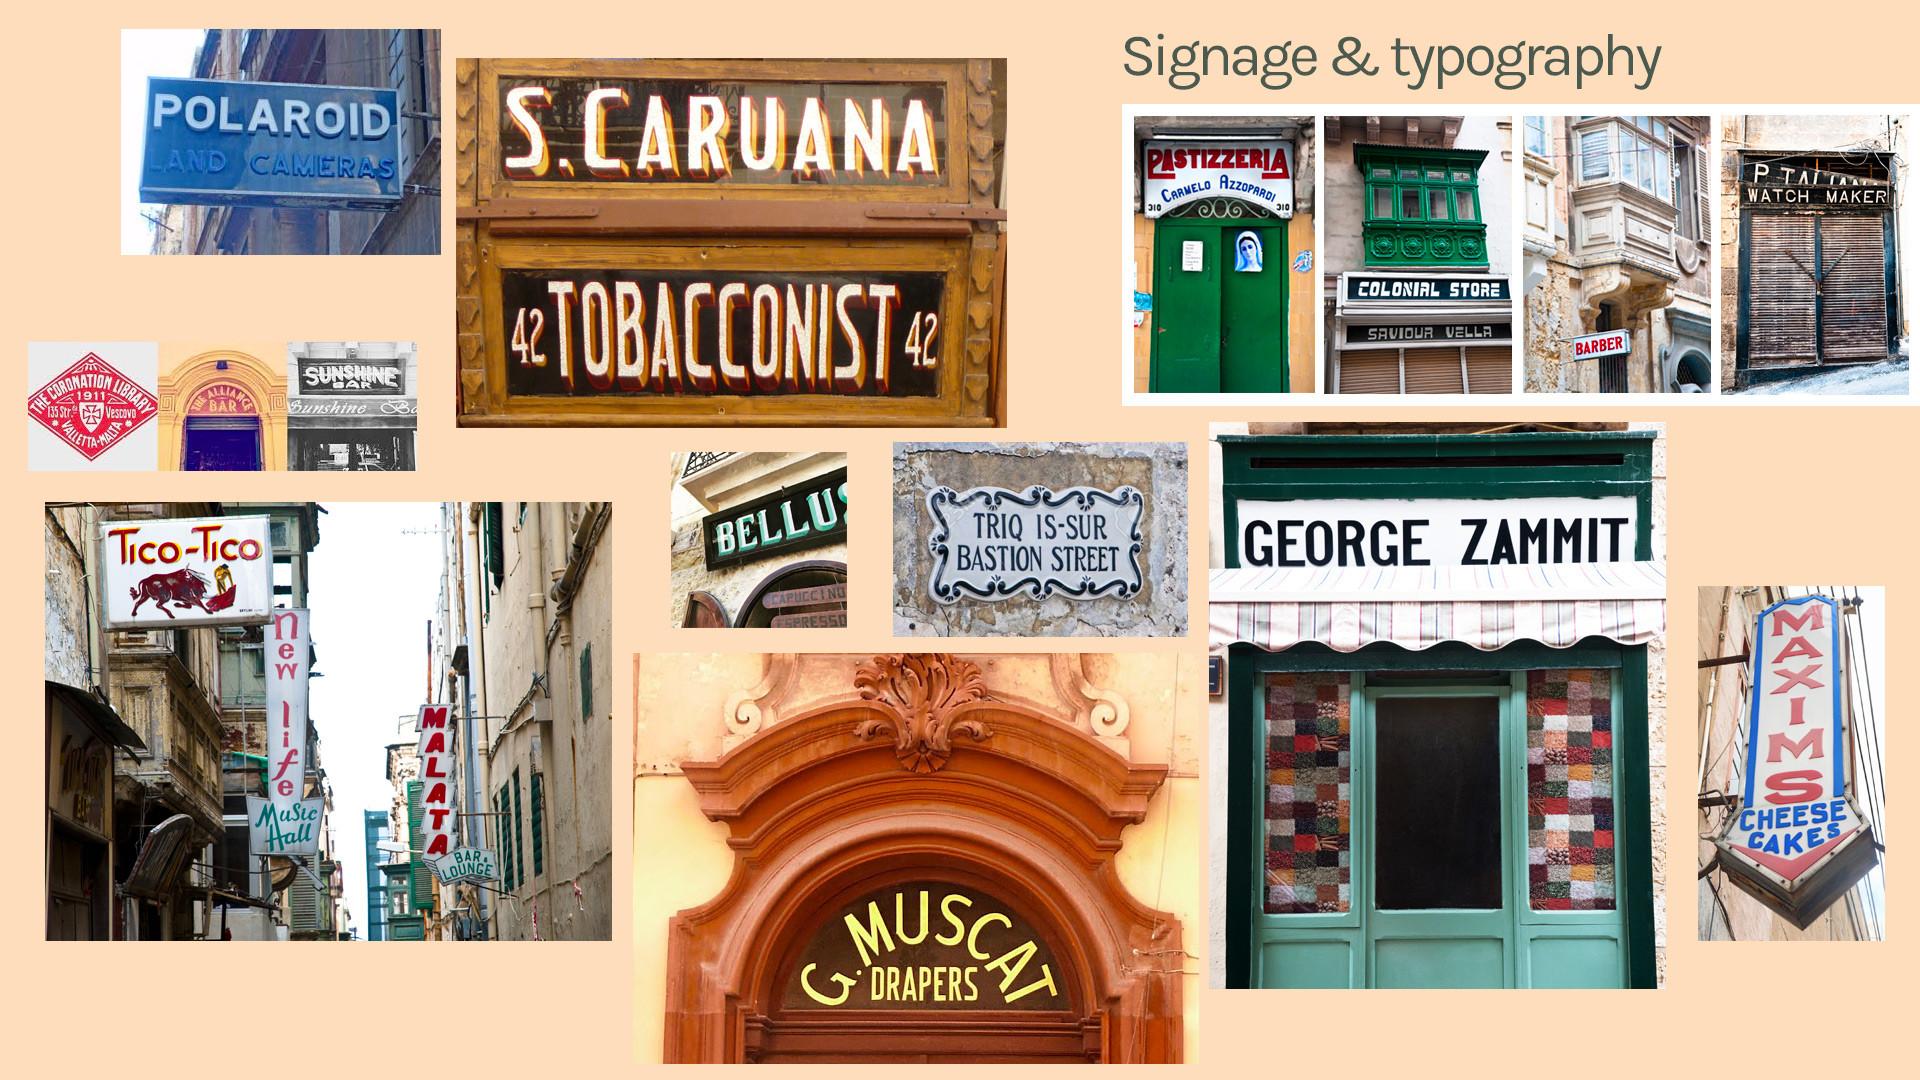 signage.jpg.1bea2c56868efde0ea54edeacc51ec37.jpg